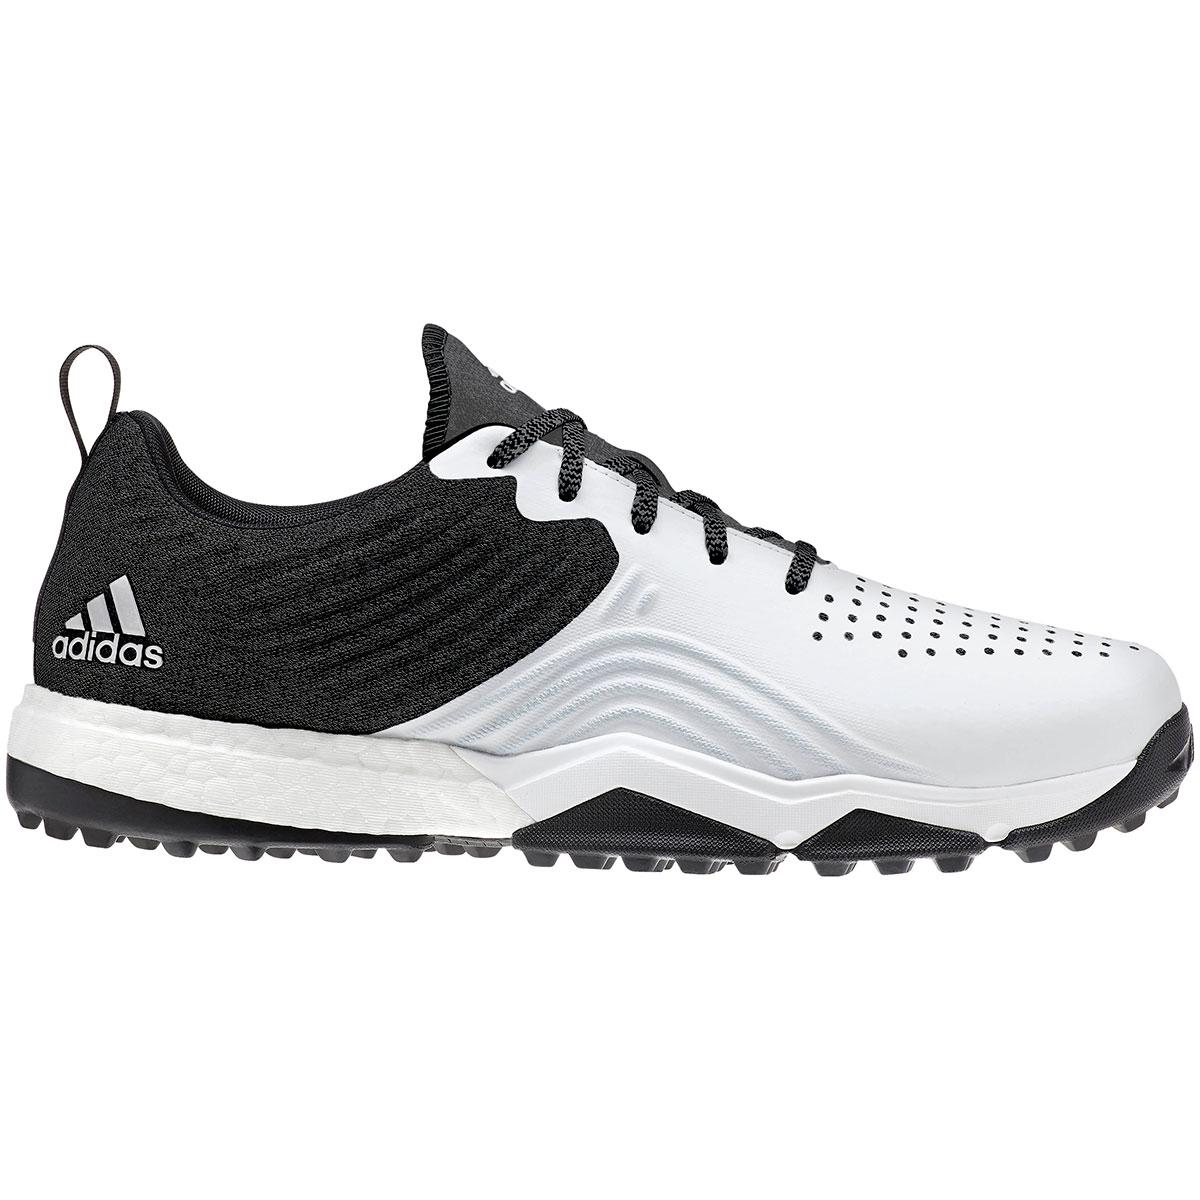 Adidas Men's Adpower 4orged S Black/White Golf Shoe